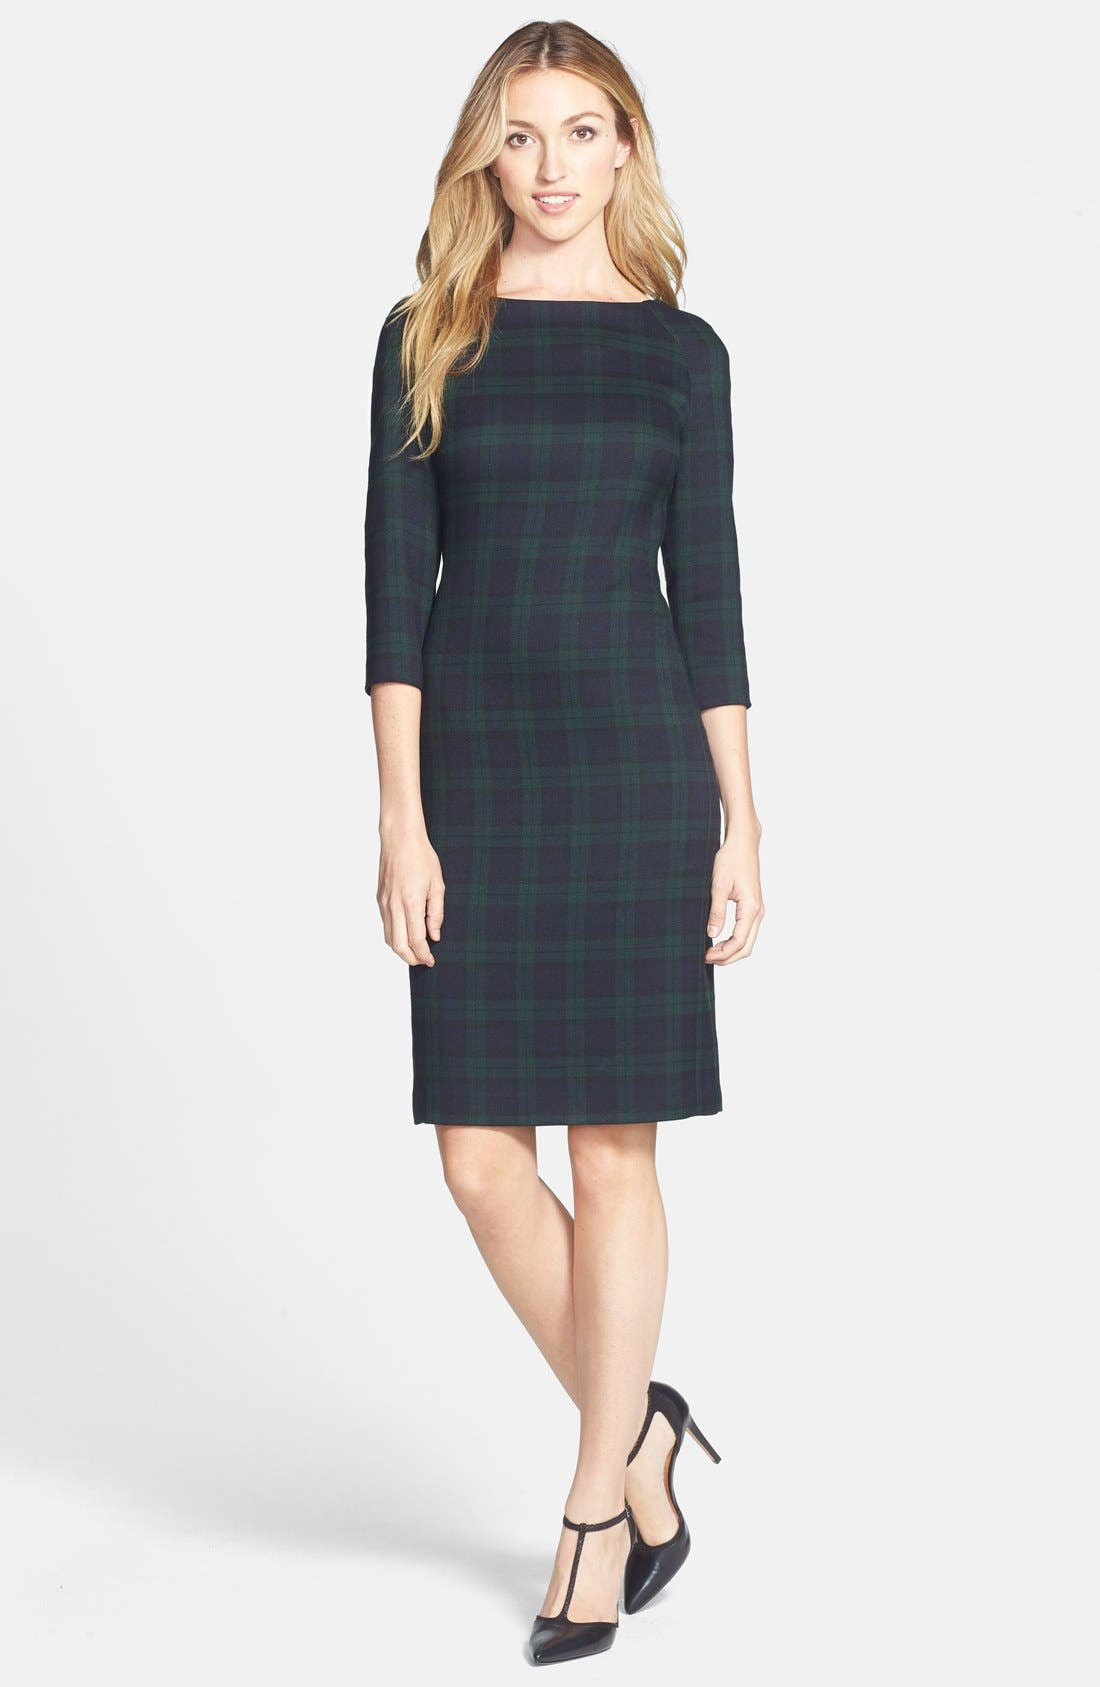 Alternate Image 1 Selected - Anne Klein Plaid Sheath Dress